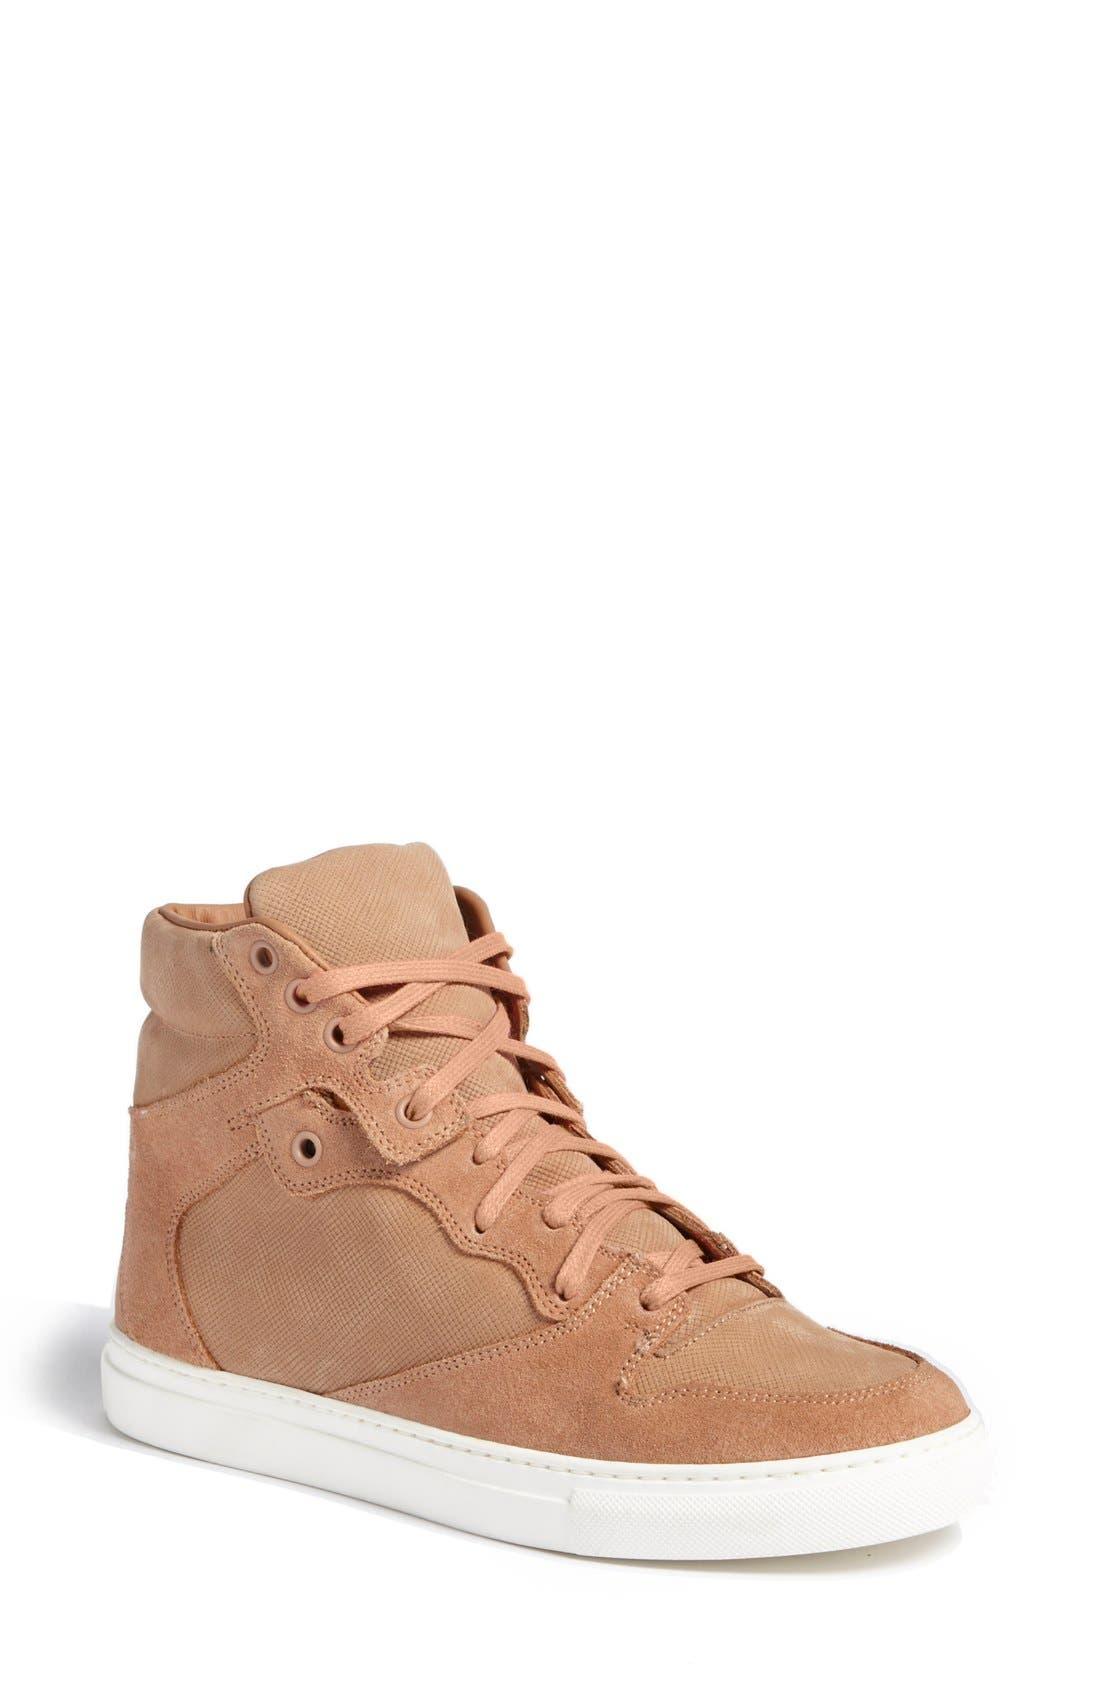 Main Image - Balenciaga 'Trainer' High Top Sneaker (Women)